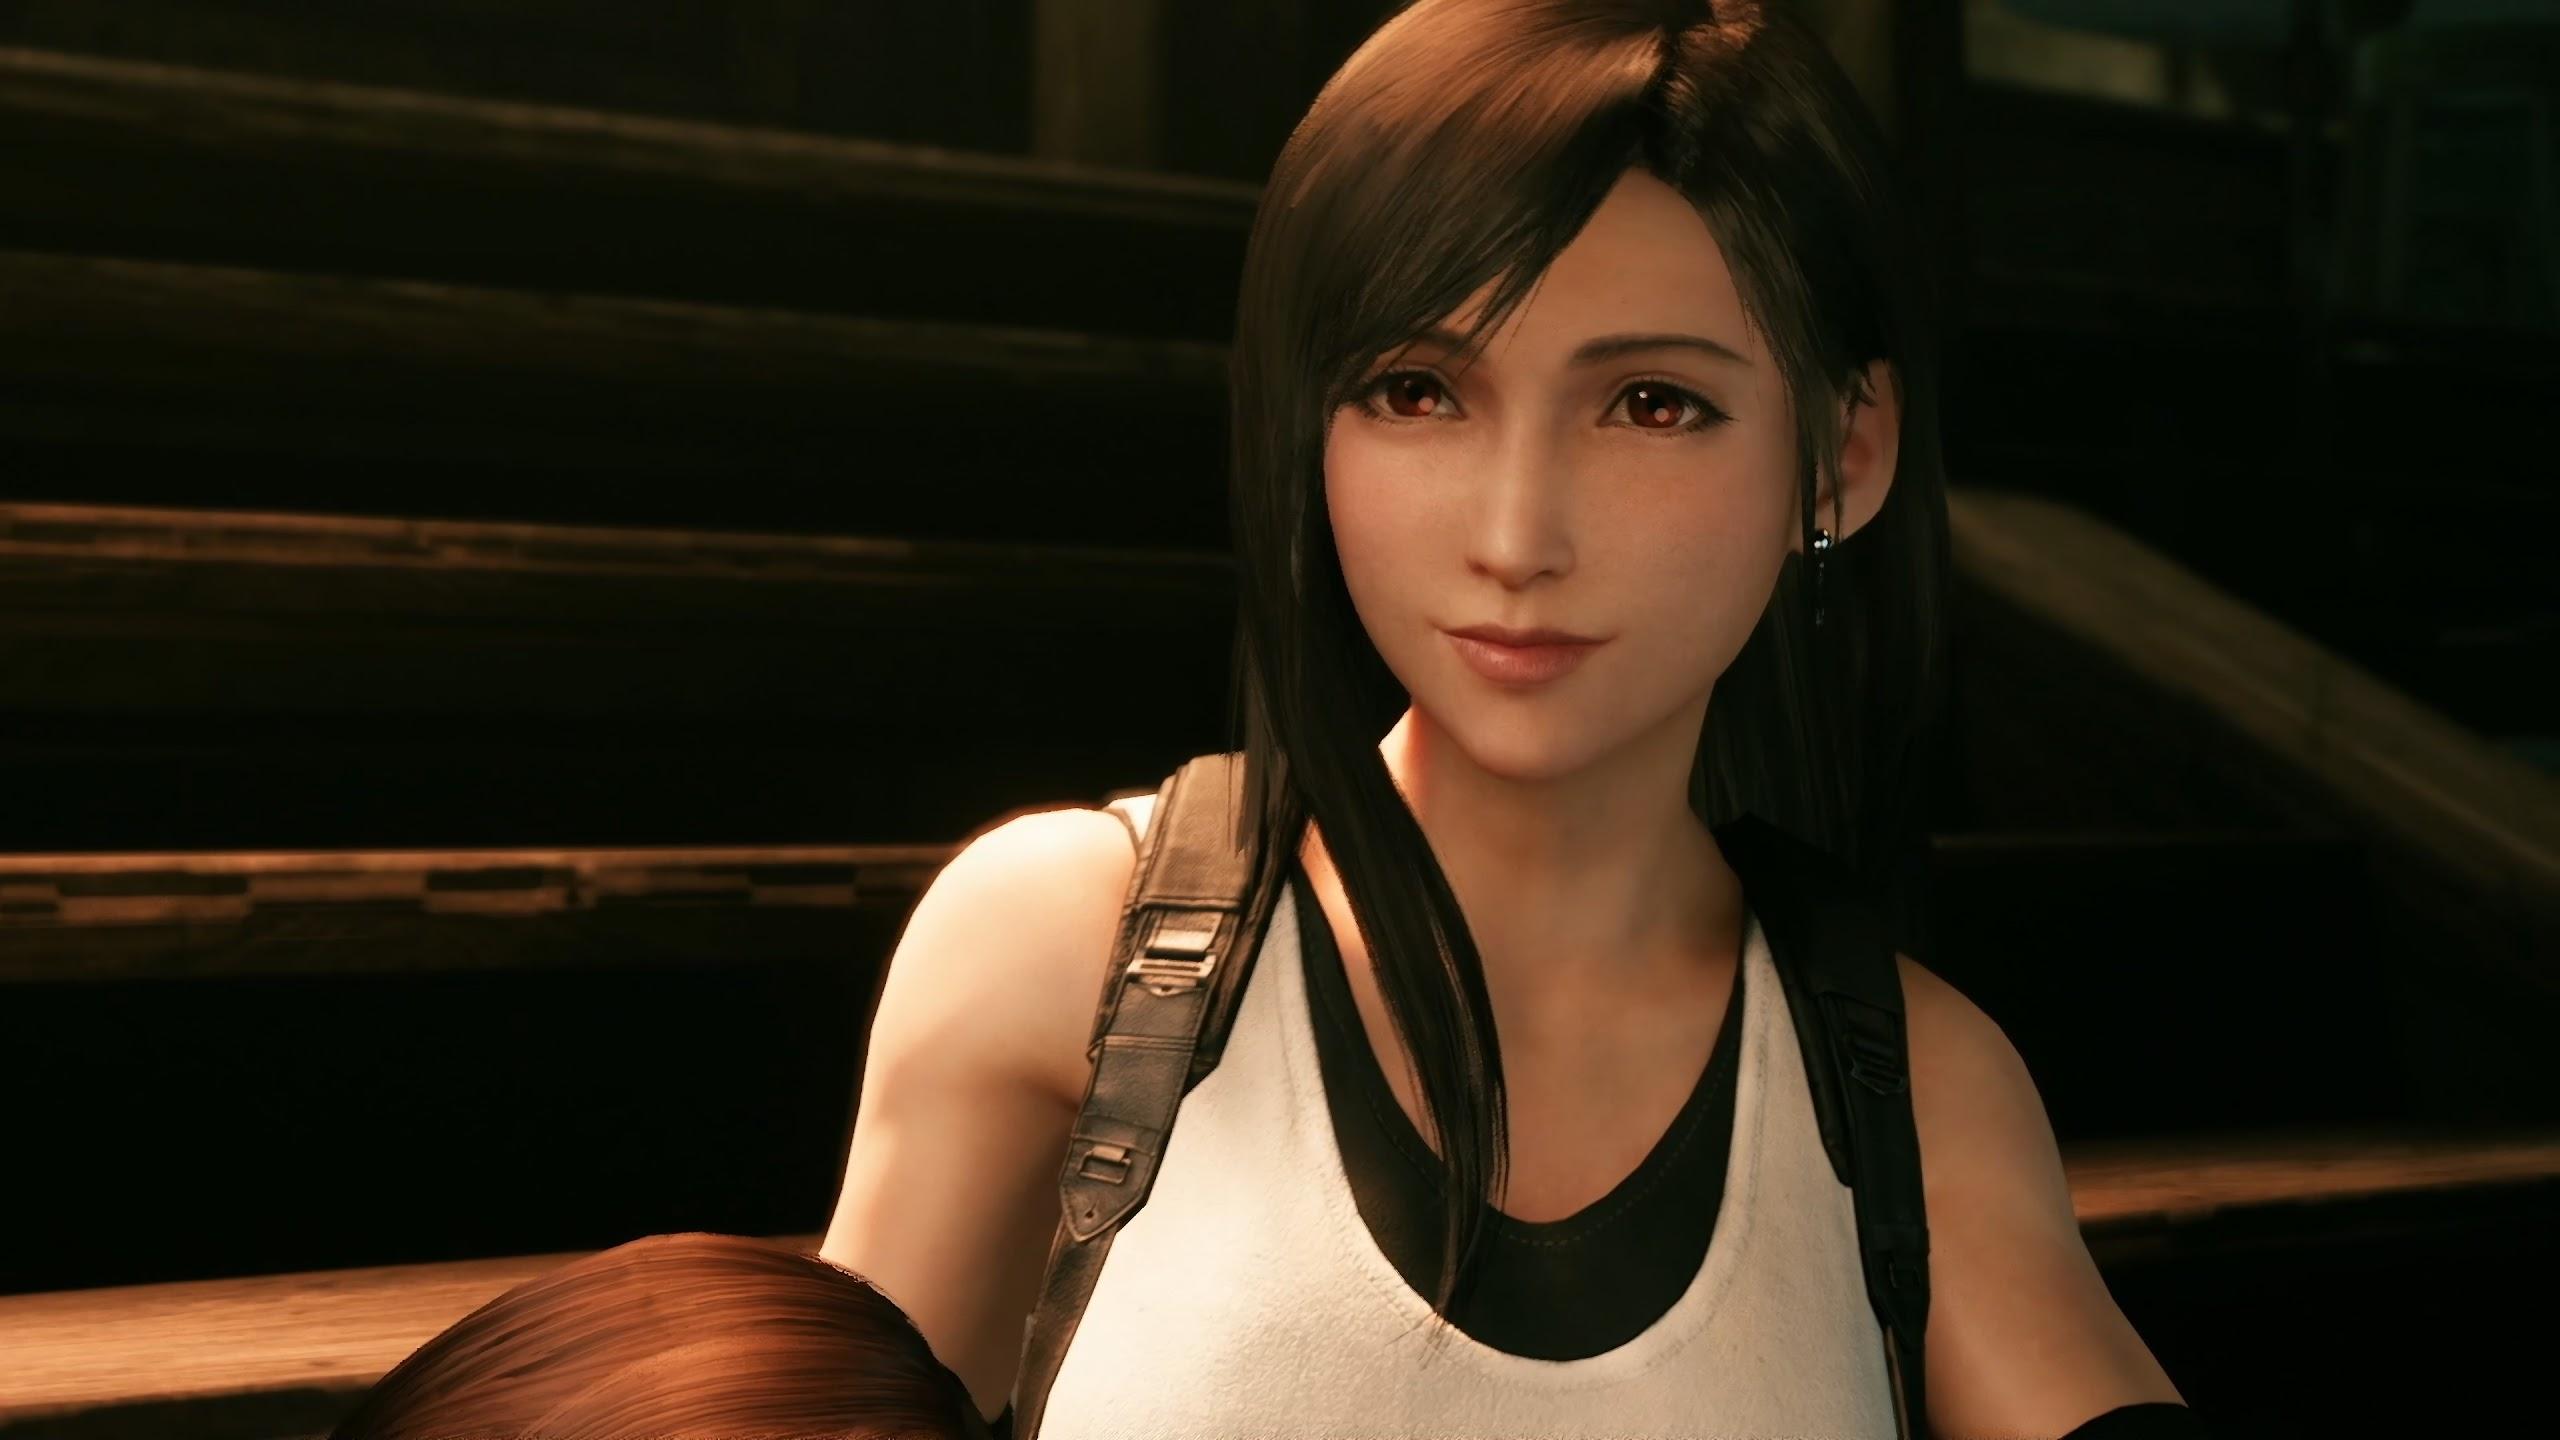 2932x2932 Tifa Lockhart Final Fantasy Artwork Ipad Pro: Tifa Lockhart, Final Fantasy 7 Remake, 4K, #19 Wallpaper